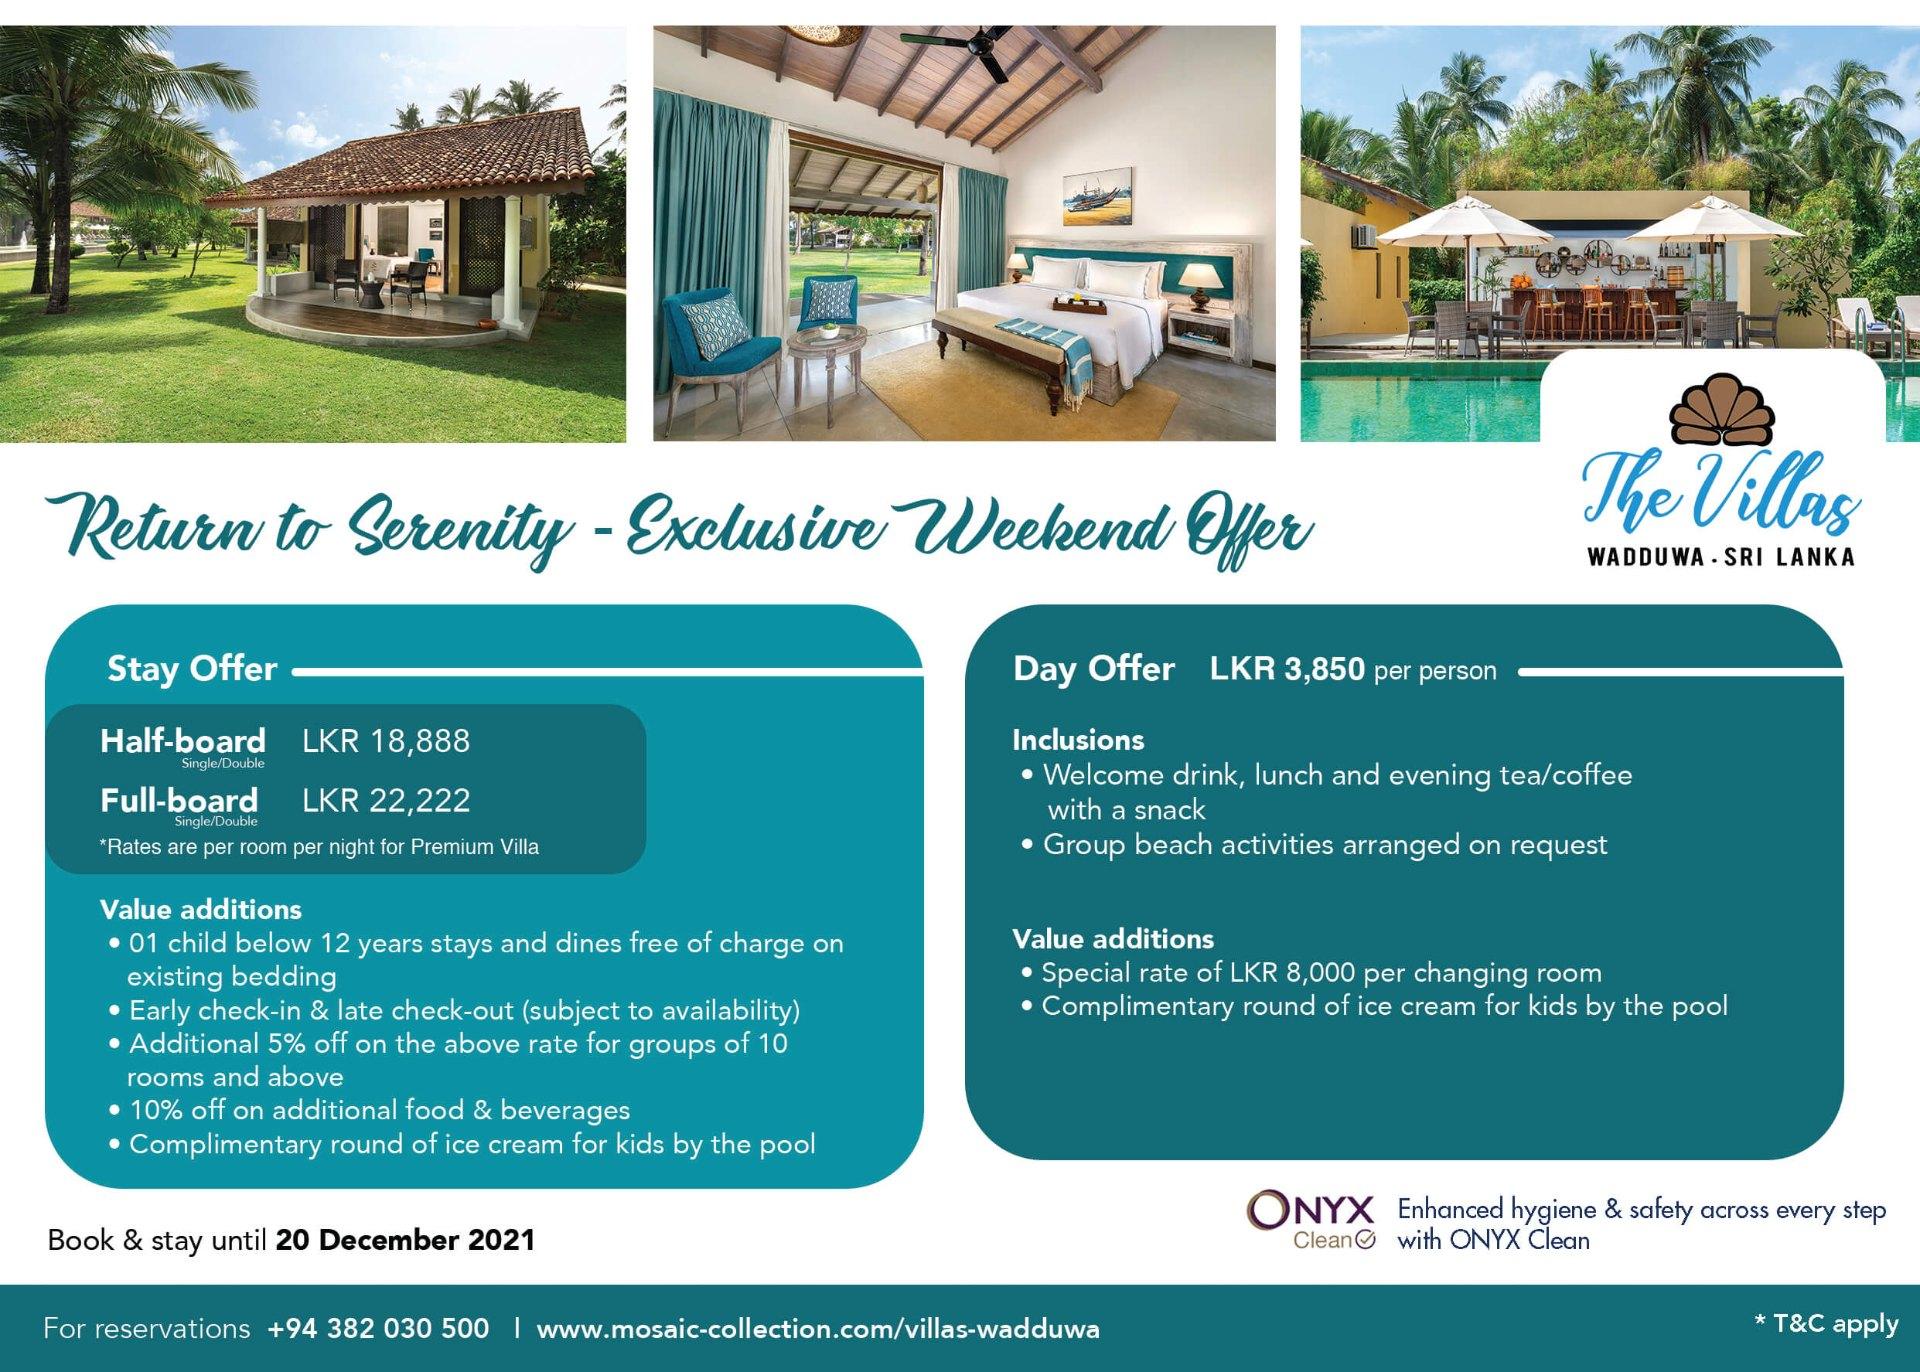 Return to serenity - exclusive weekend offer